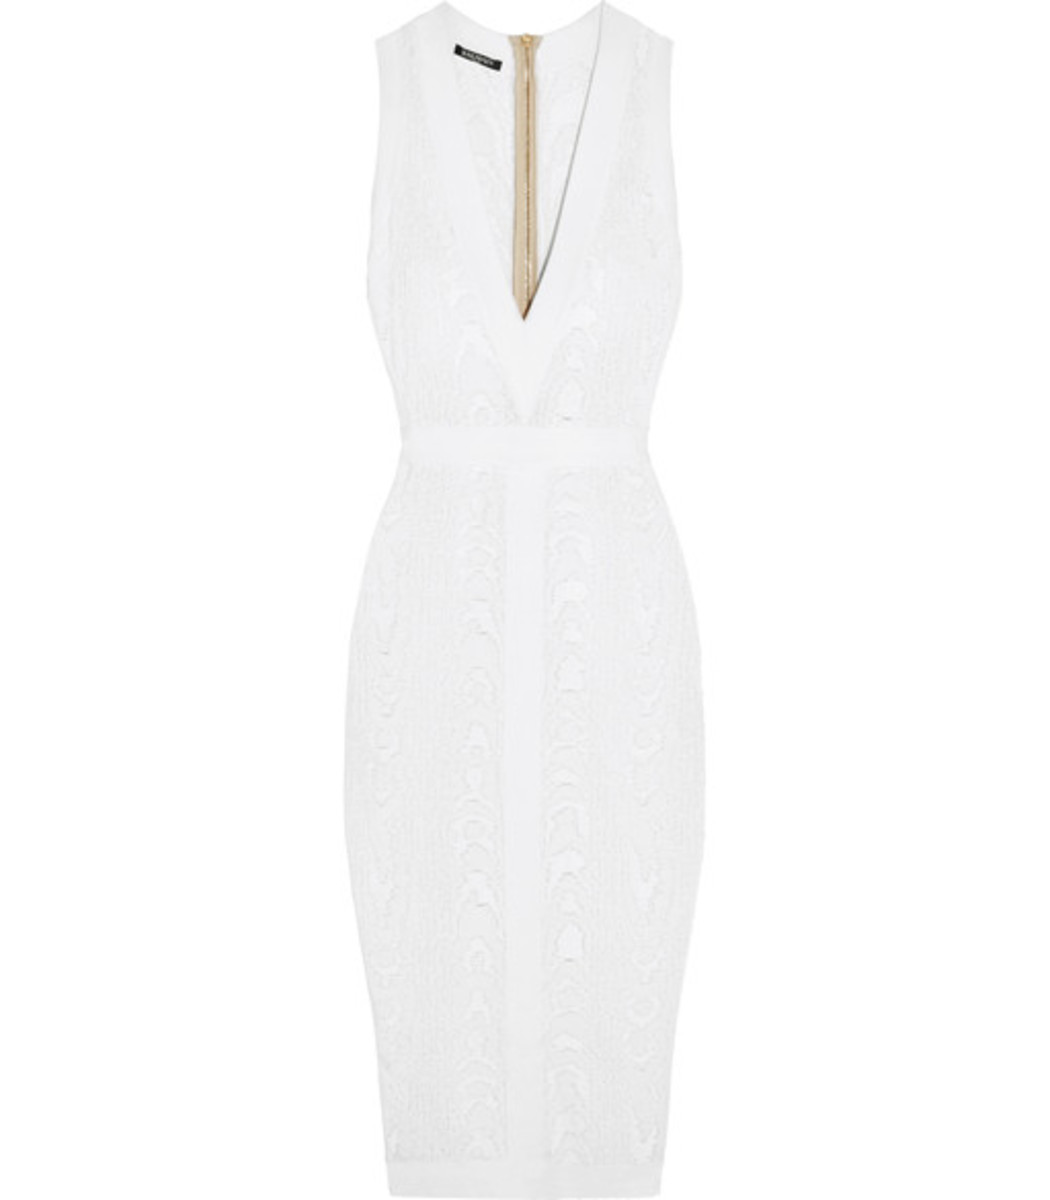 Balmain Midi dresses White Knitted-Jacquard Dress